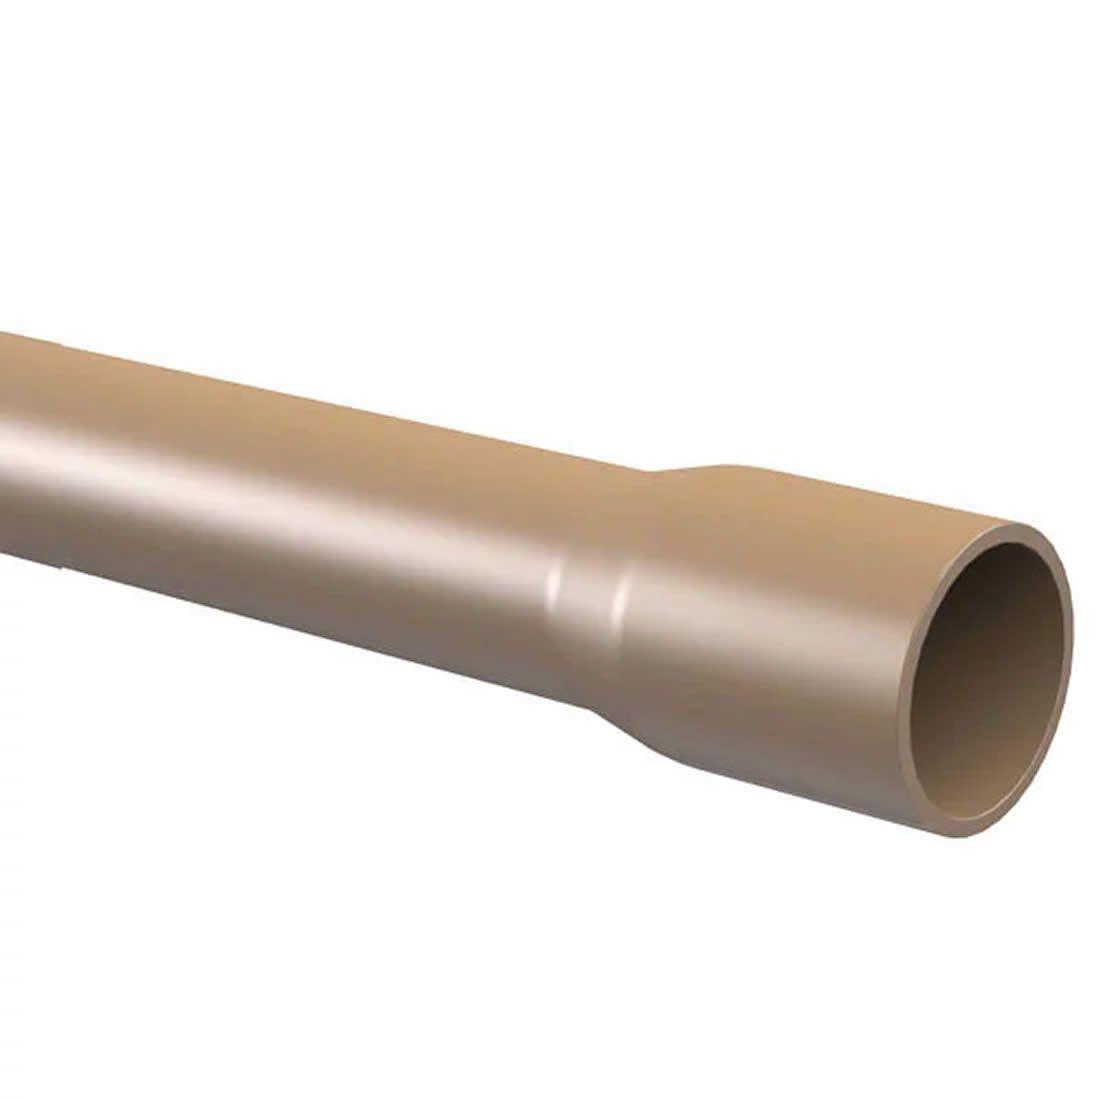 Tubo PVC Soldável 75mm X 6 Metros Tigre